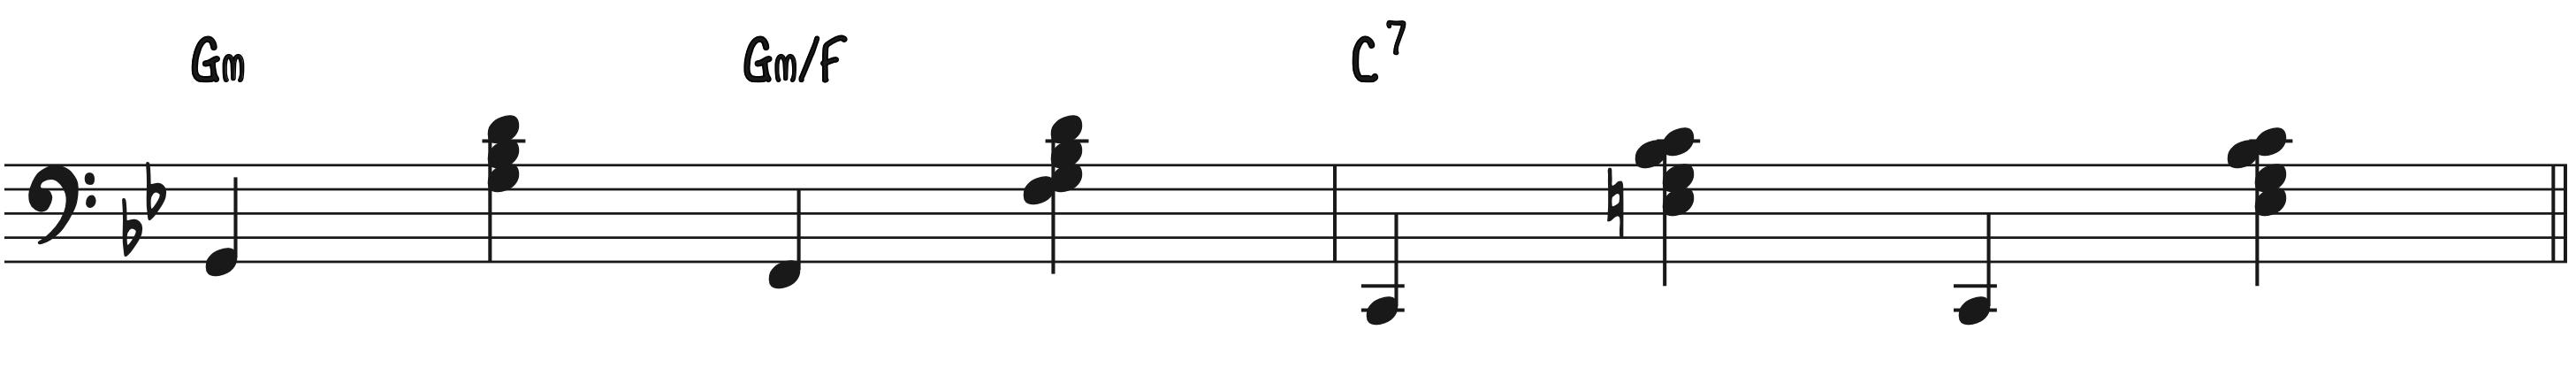 Intermediate Rock Piano Accompaniment Left Hand